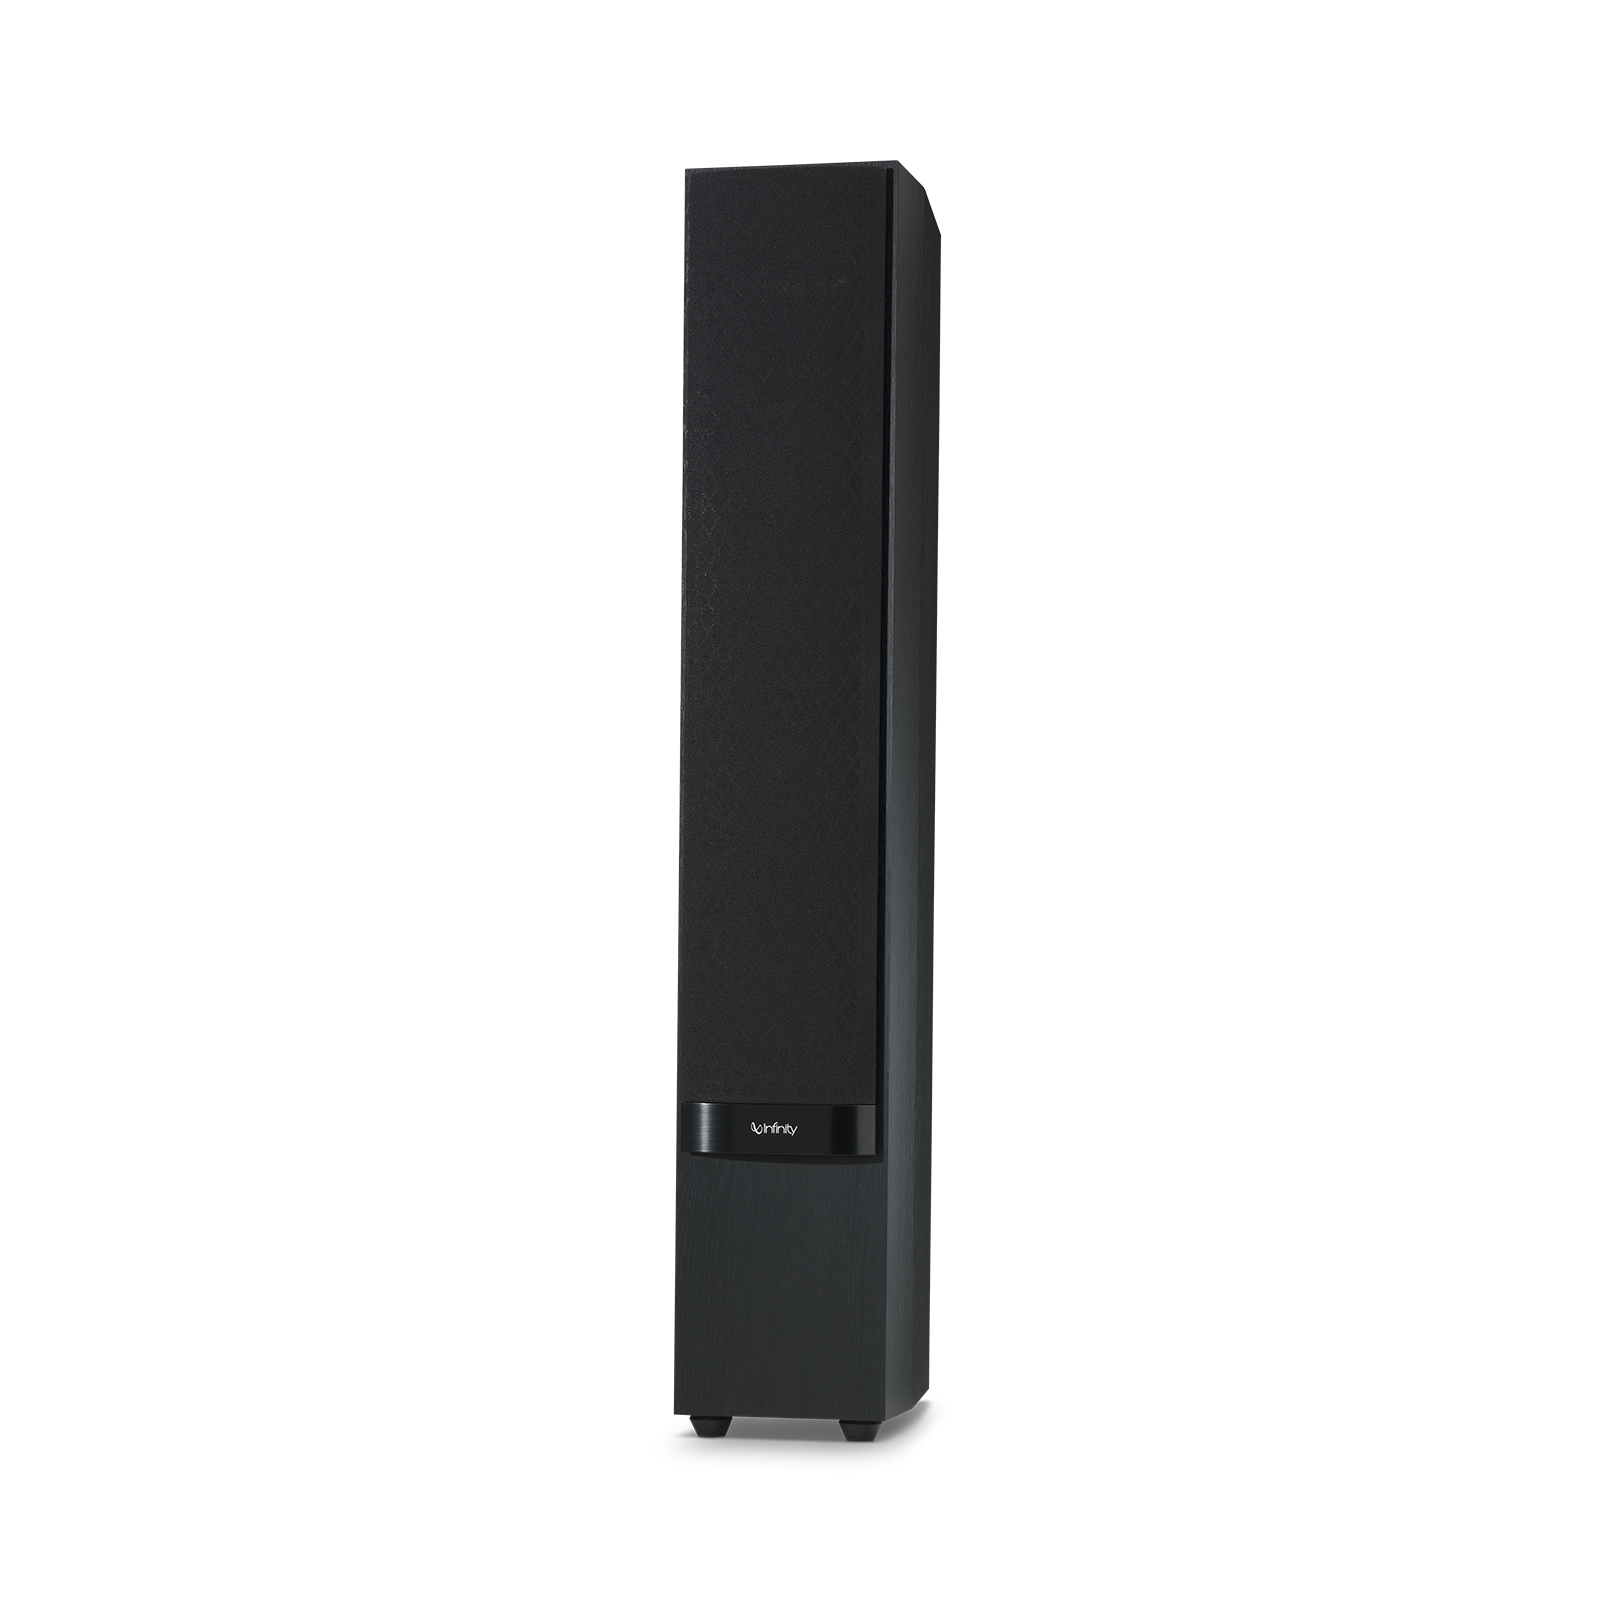 "Reference 253 - Black - 5-1/4"" 3-Way Floorstanding Loudspeaker - Detailshot 3"